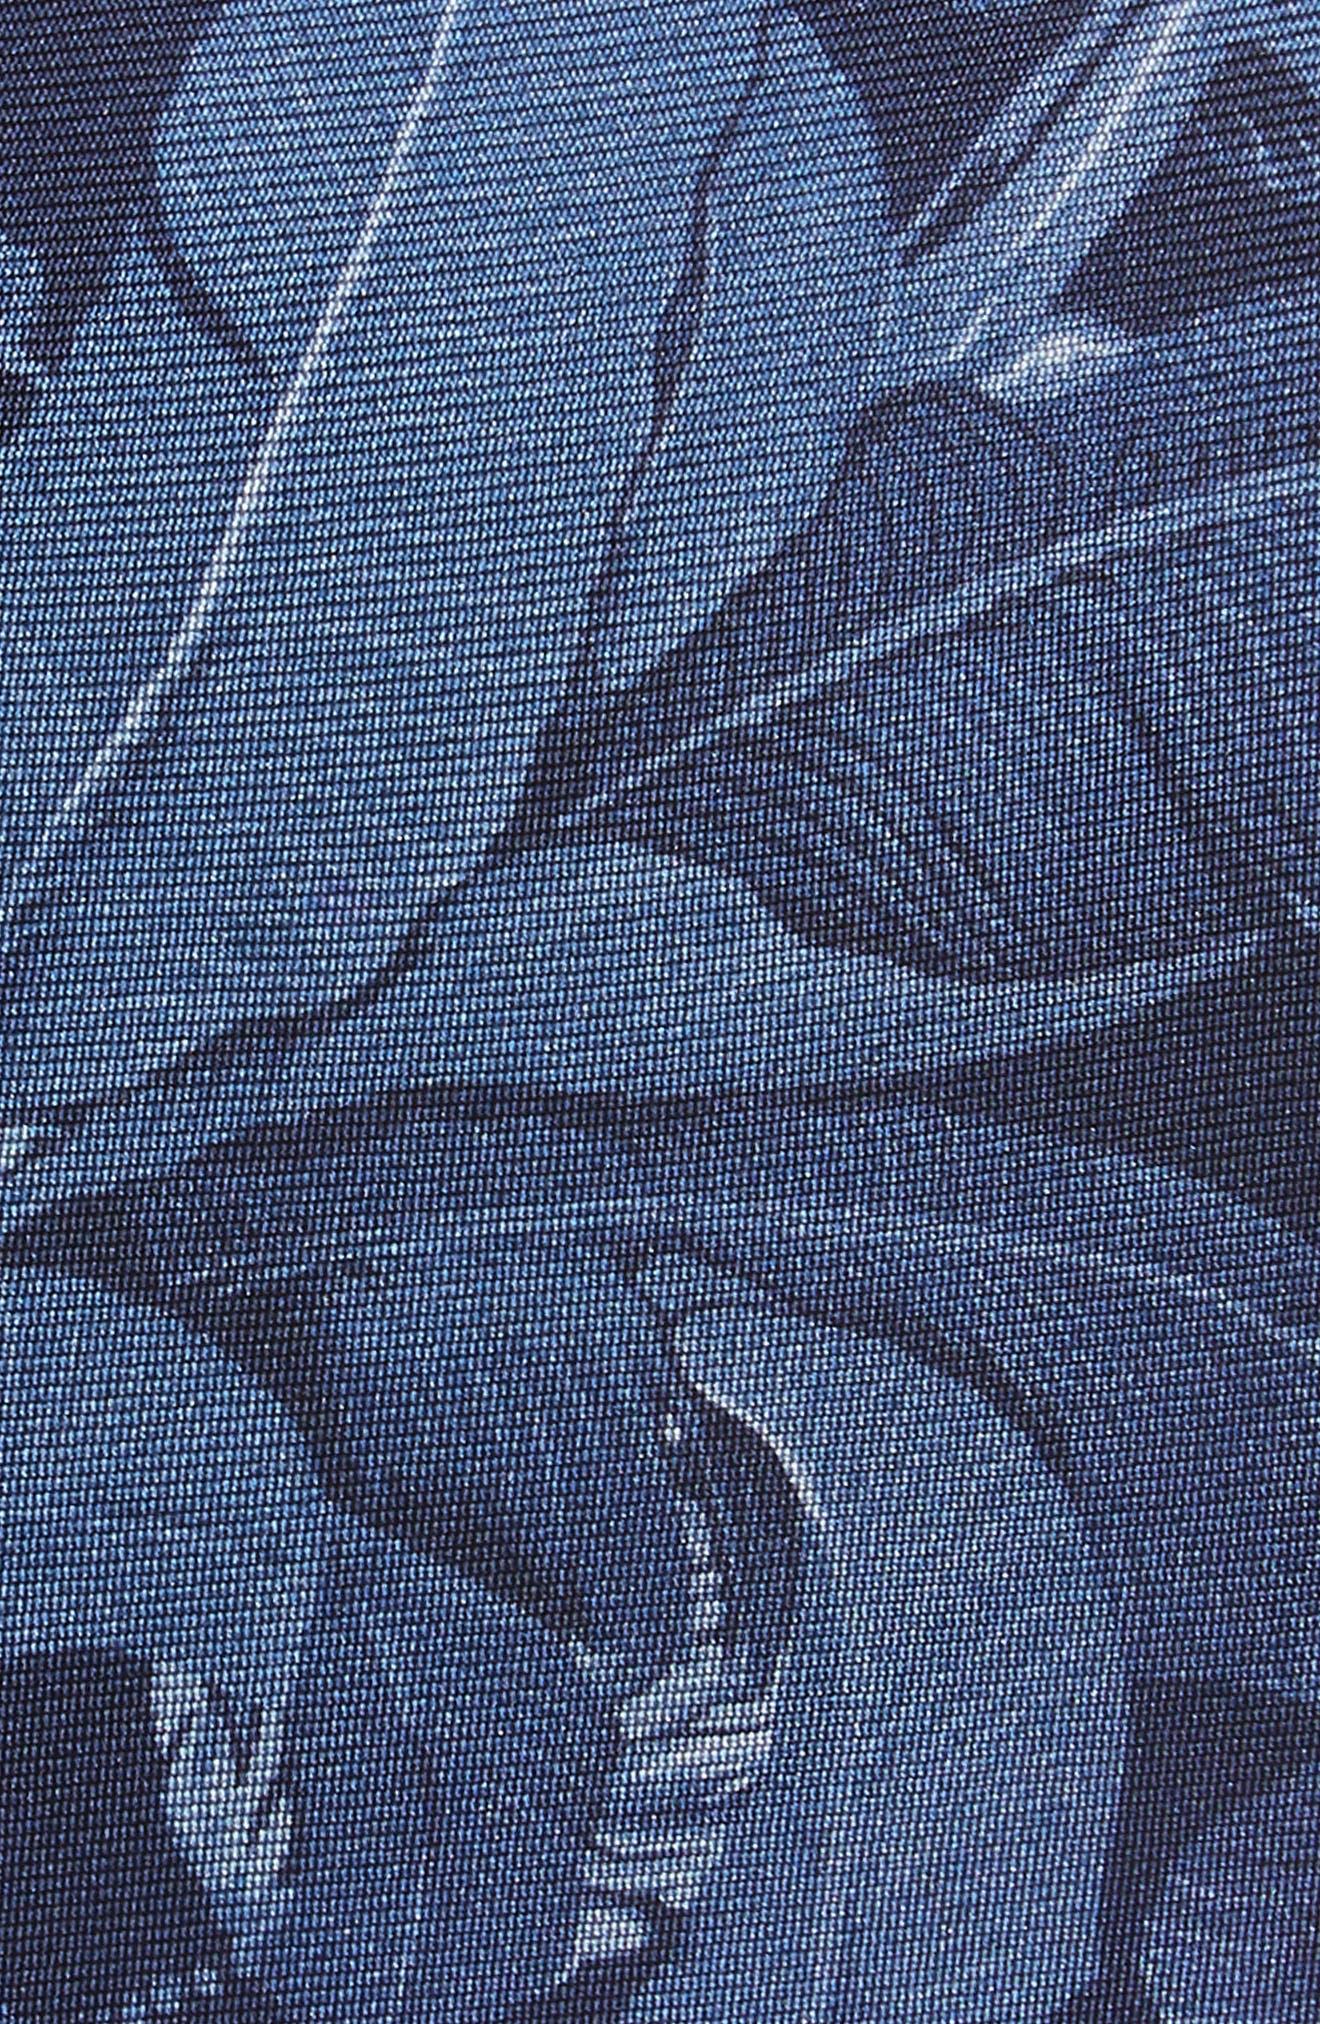 Banana Leaf Silk Tie,                             Alternate thumbnail 2, color,                             400